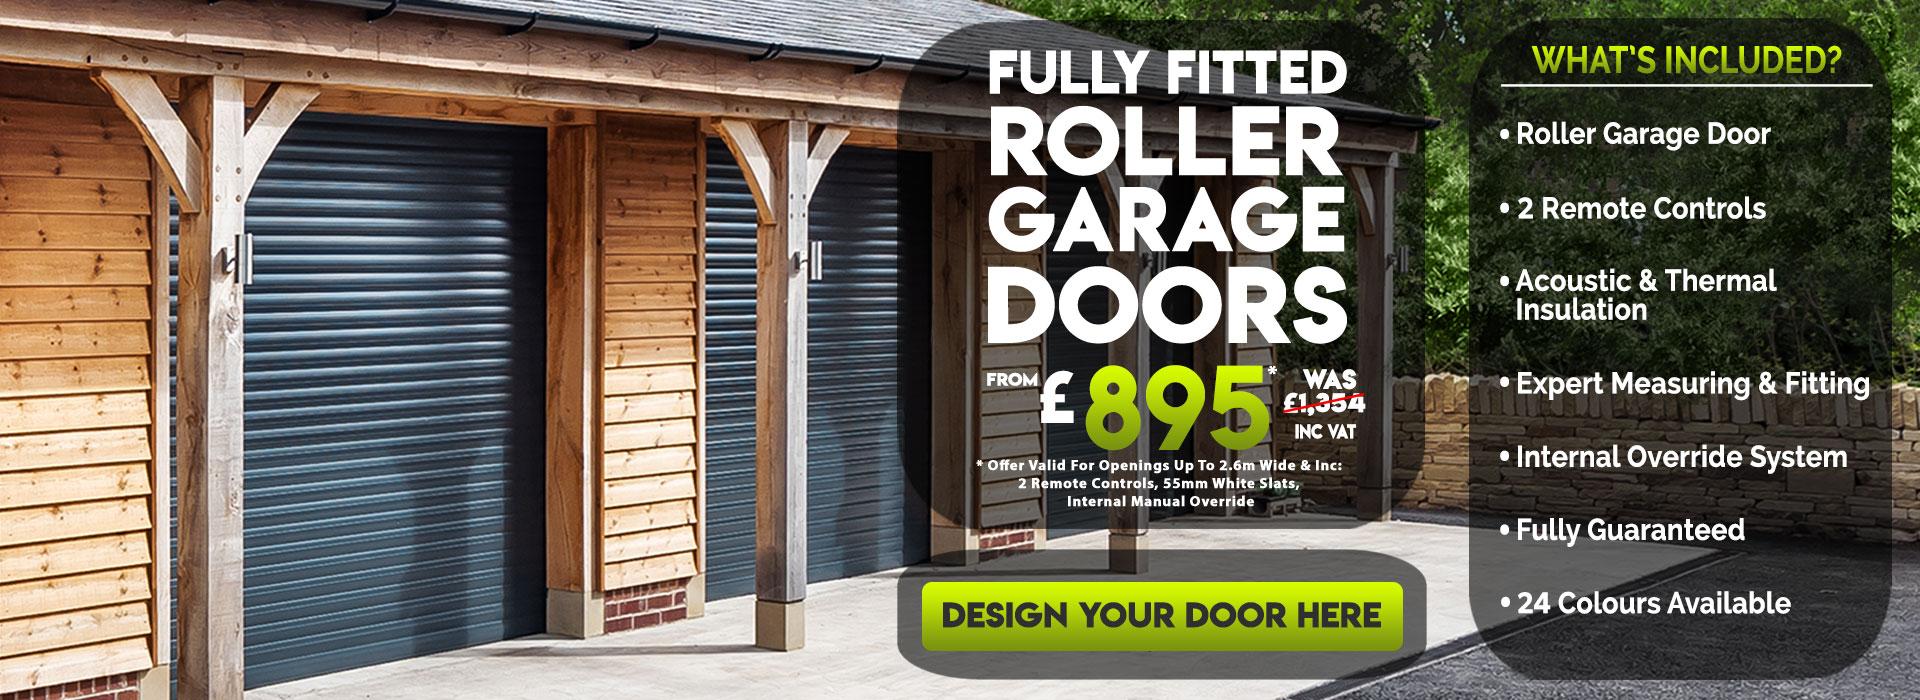 Roller Shutter Garage Doors Quality And Value Garolla